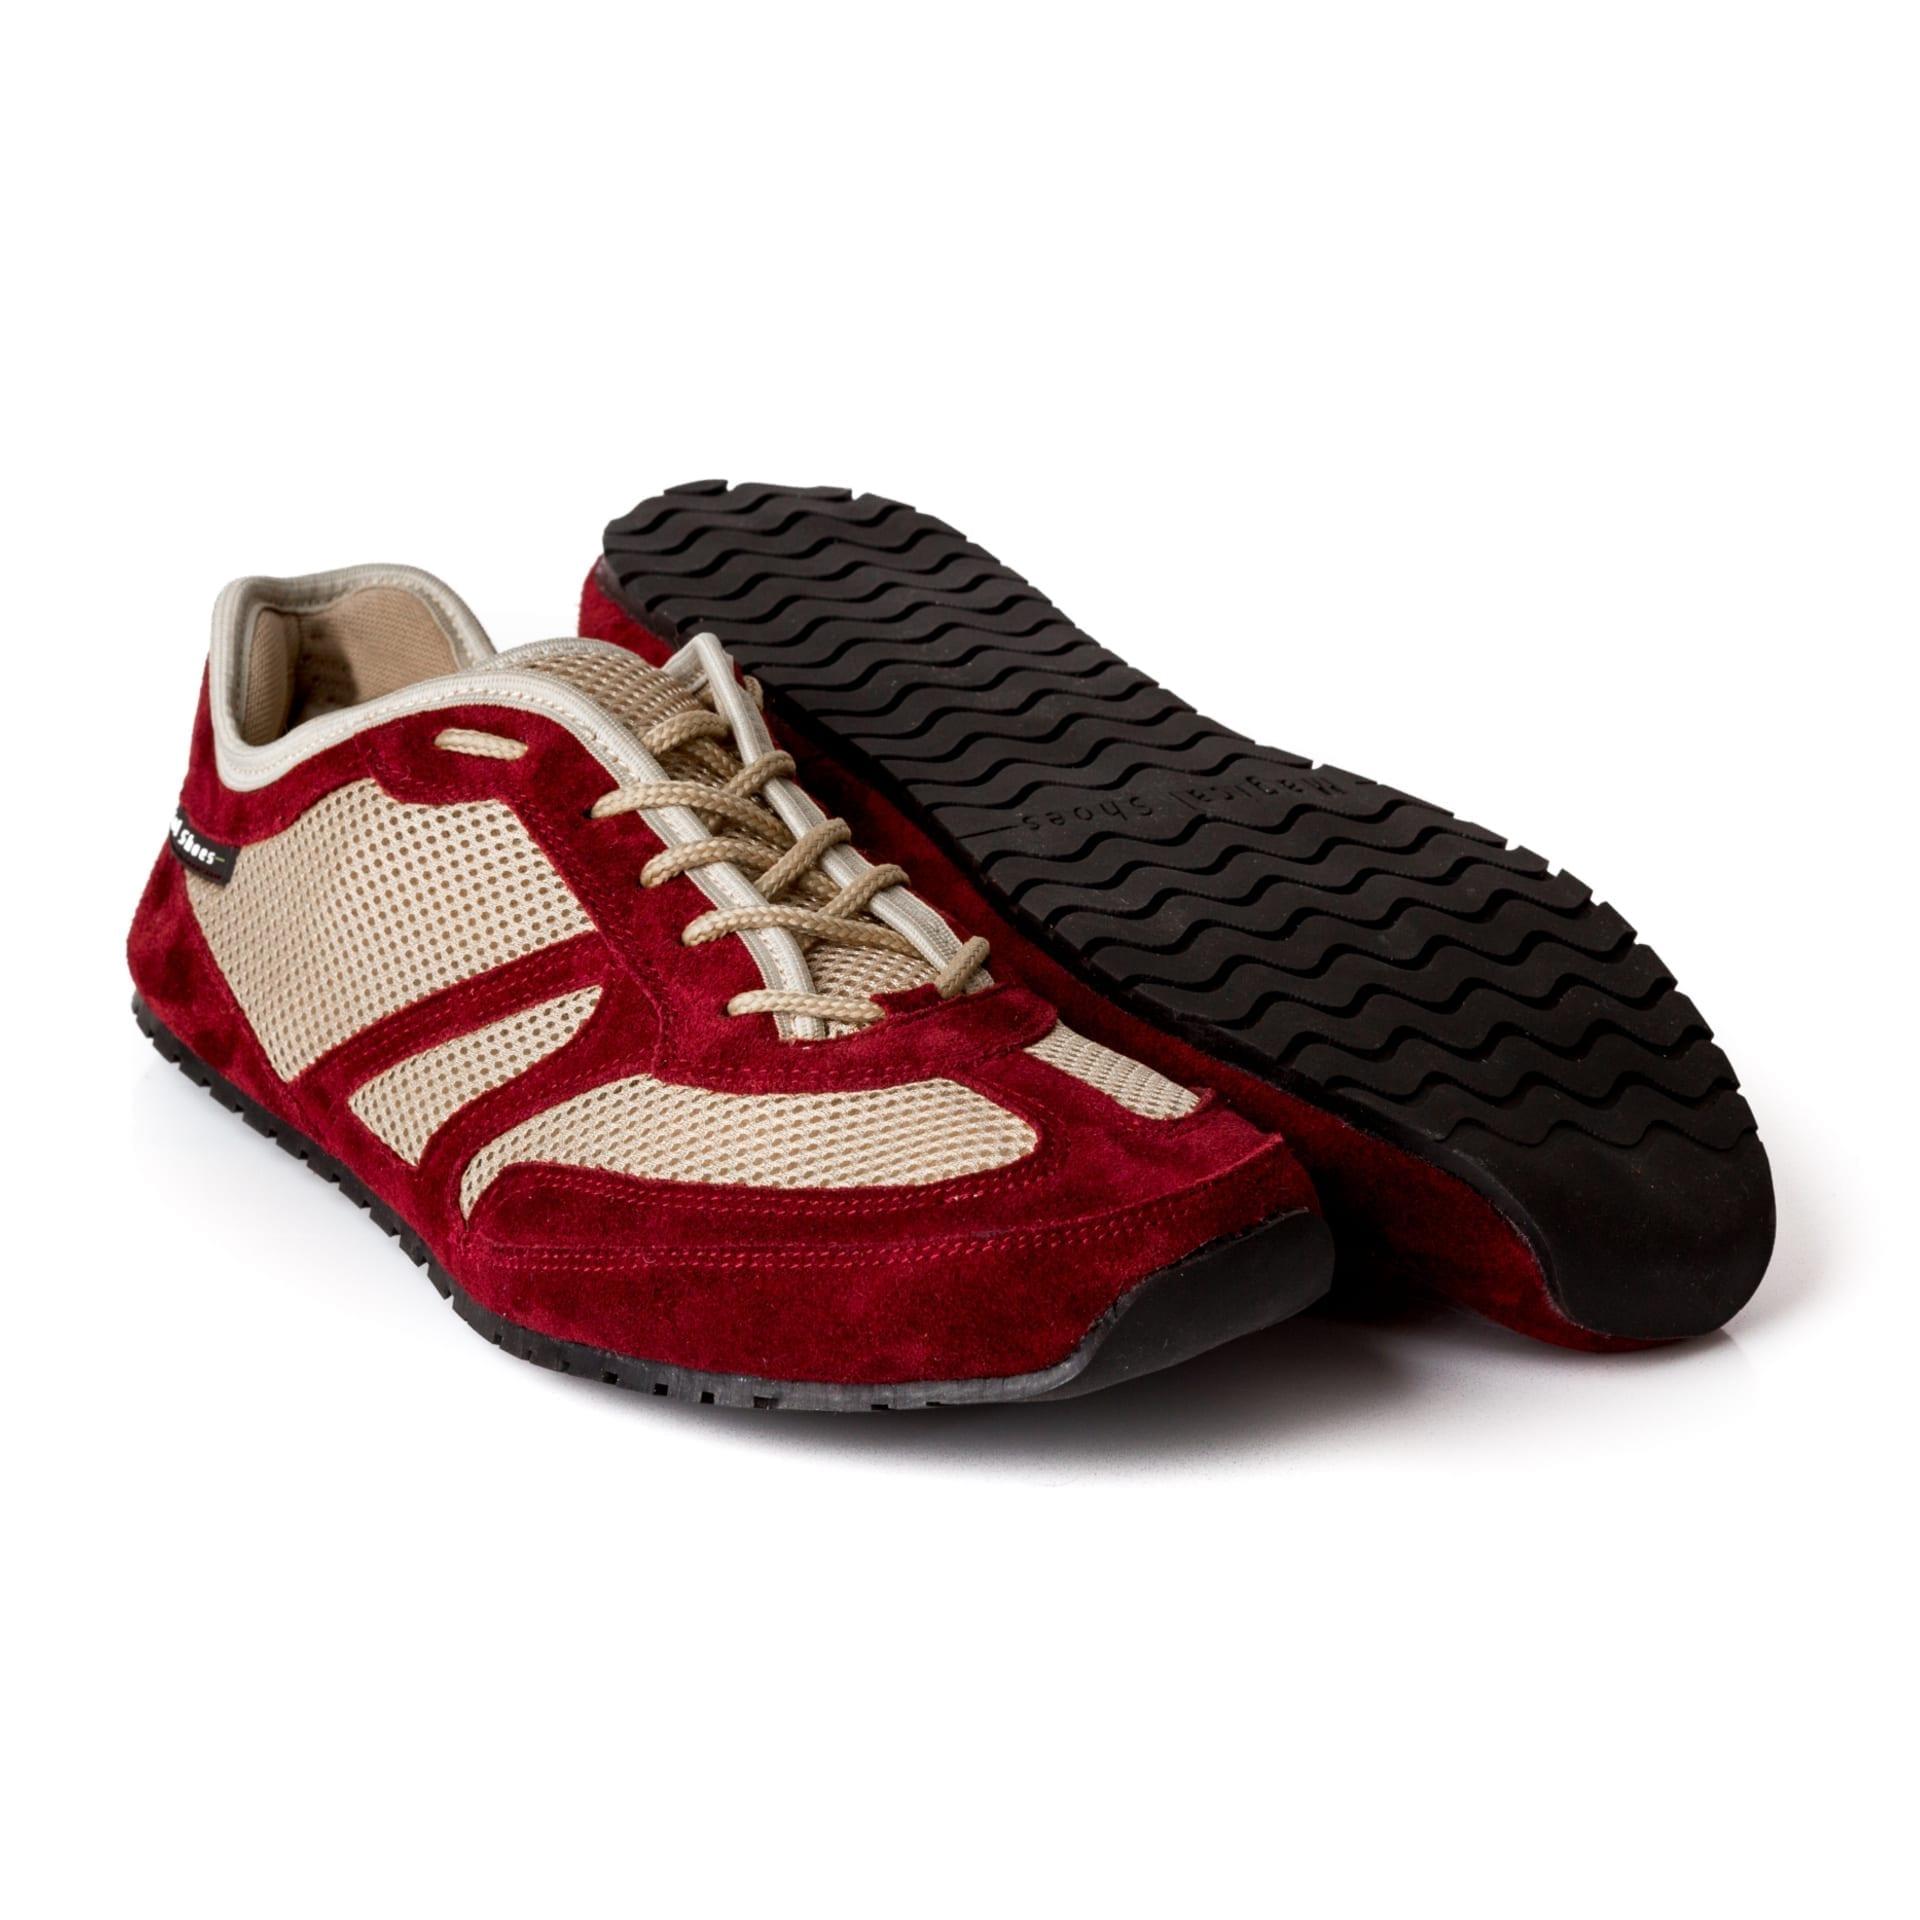 Magical Shoes EXPLORER – FRUITY CLARET BAREFOOT SHOES picture 1